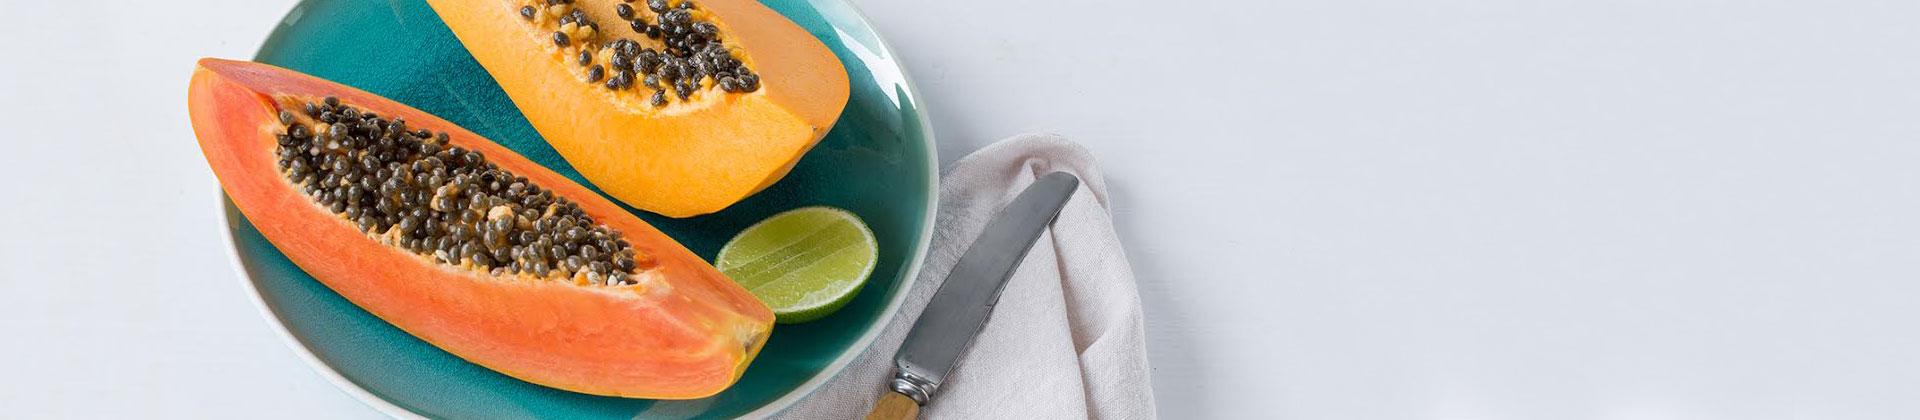 Australian Papaya and Pawpaw